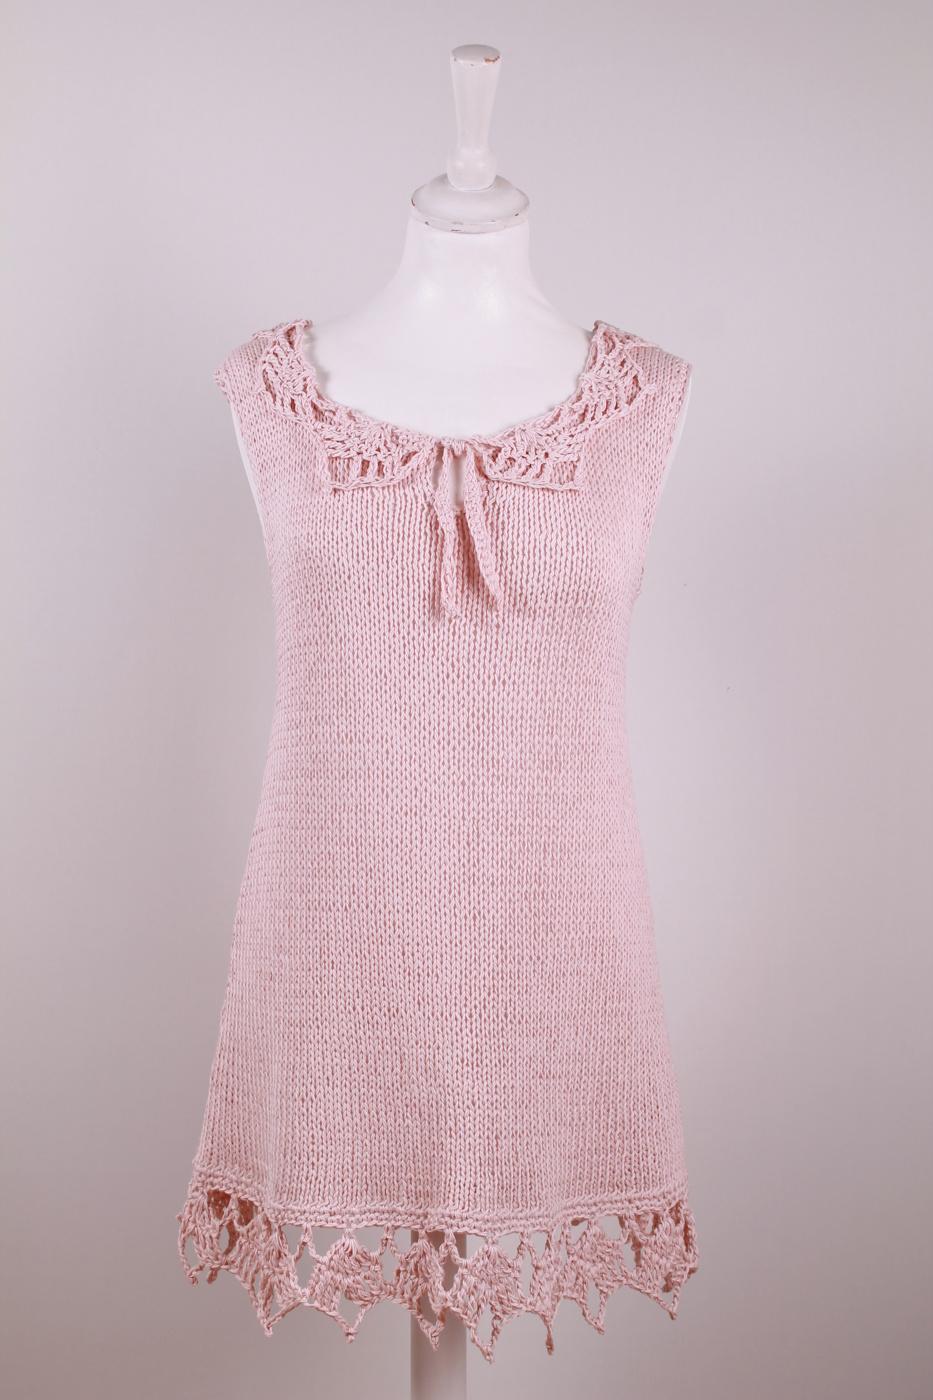 2.Alizee-varm pink